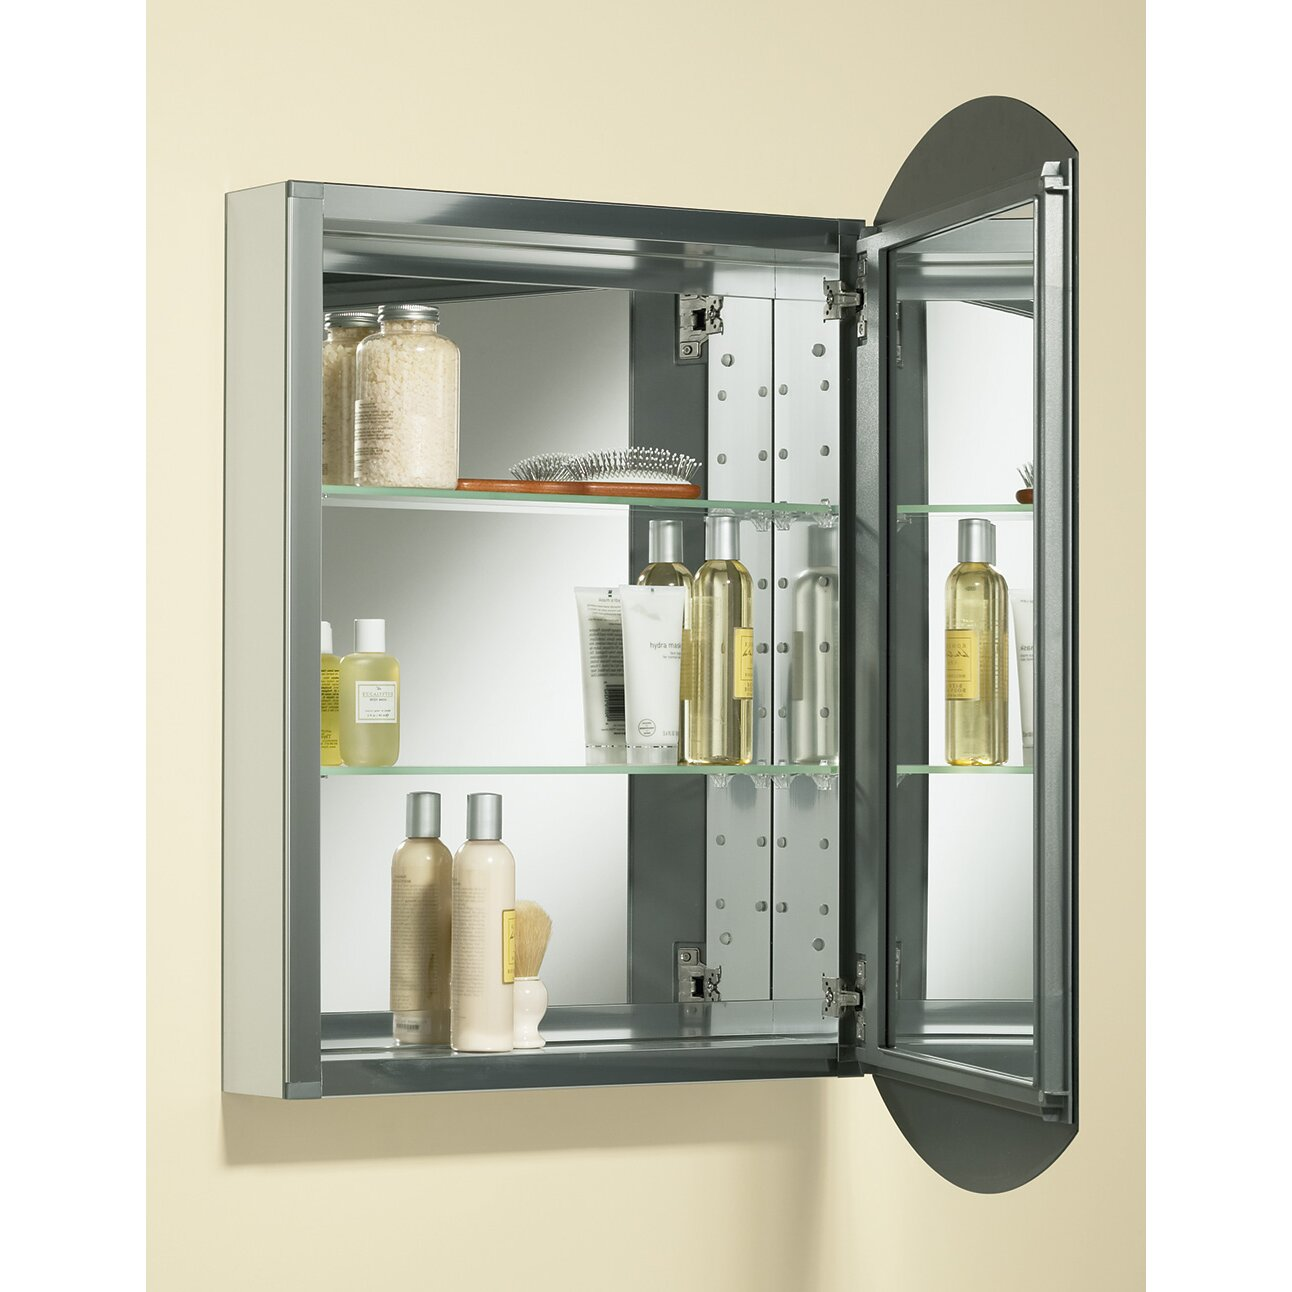 Kohler archer 20 x 31 aluminum wall mount medicine Wall mounted medicine cabinet